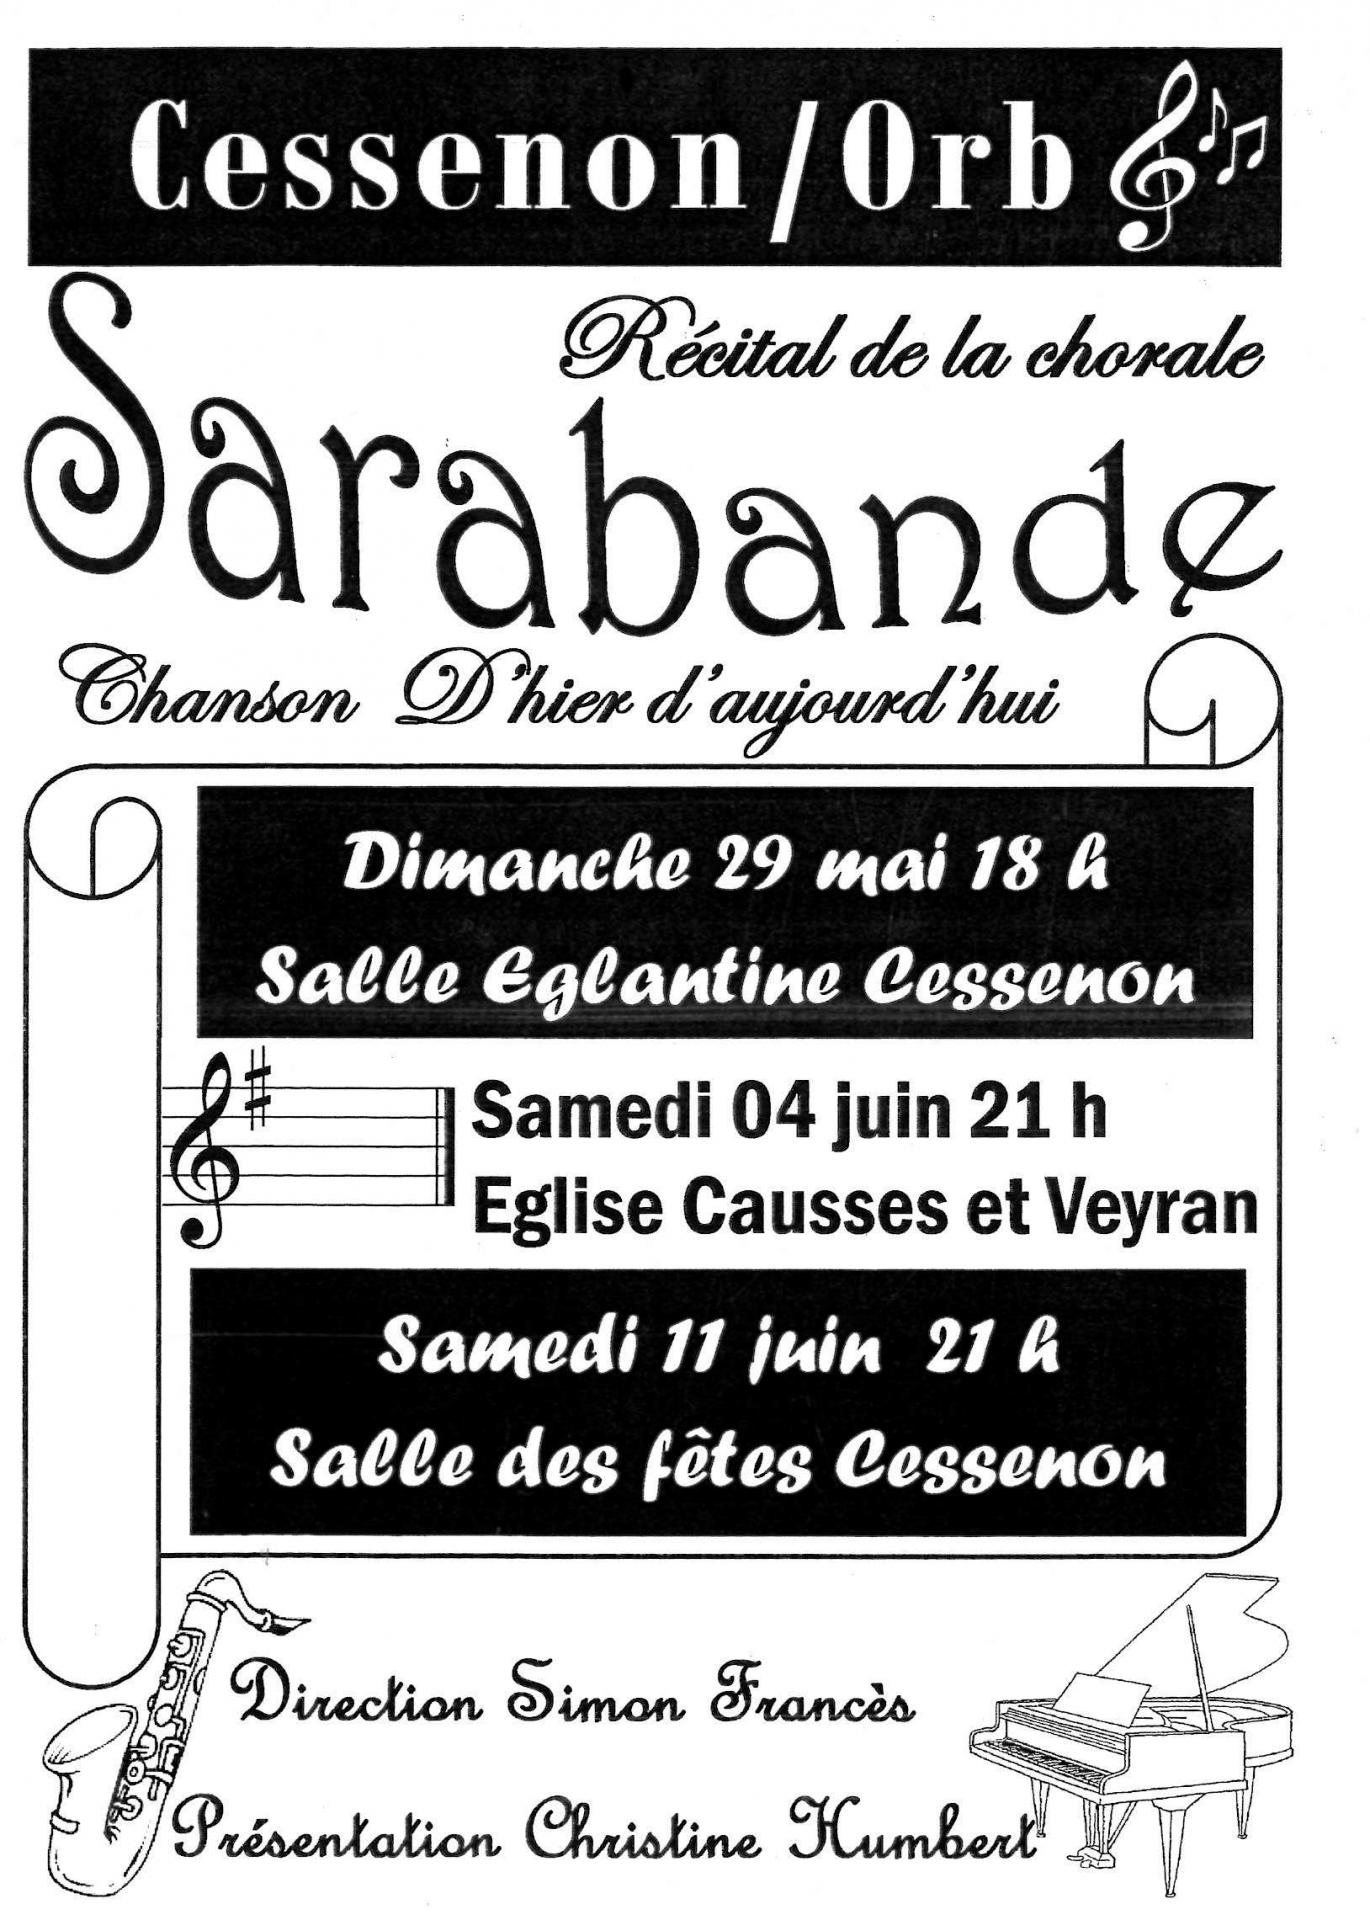 2016 05 29 chorale sarabande